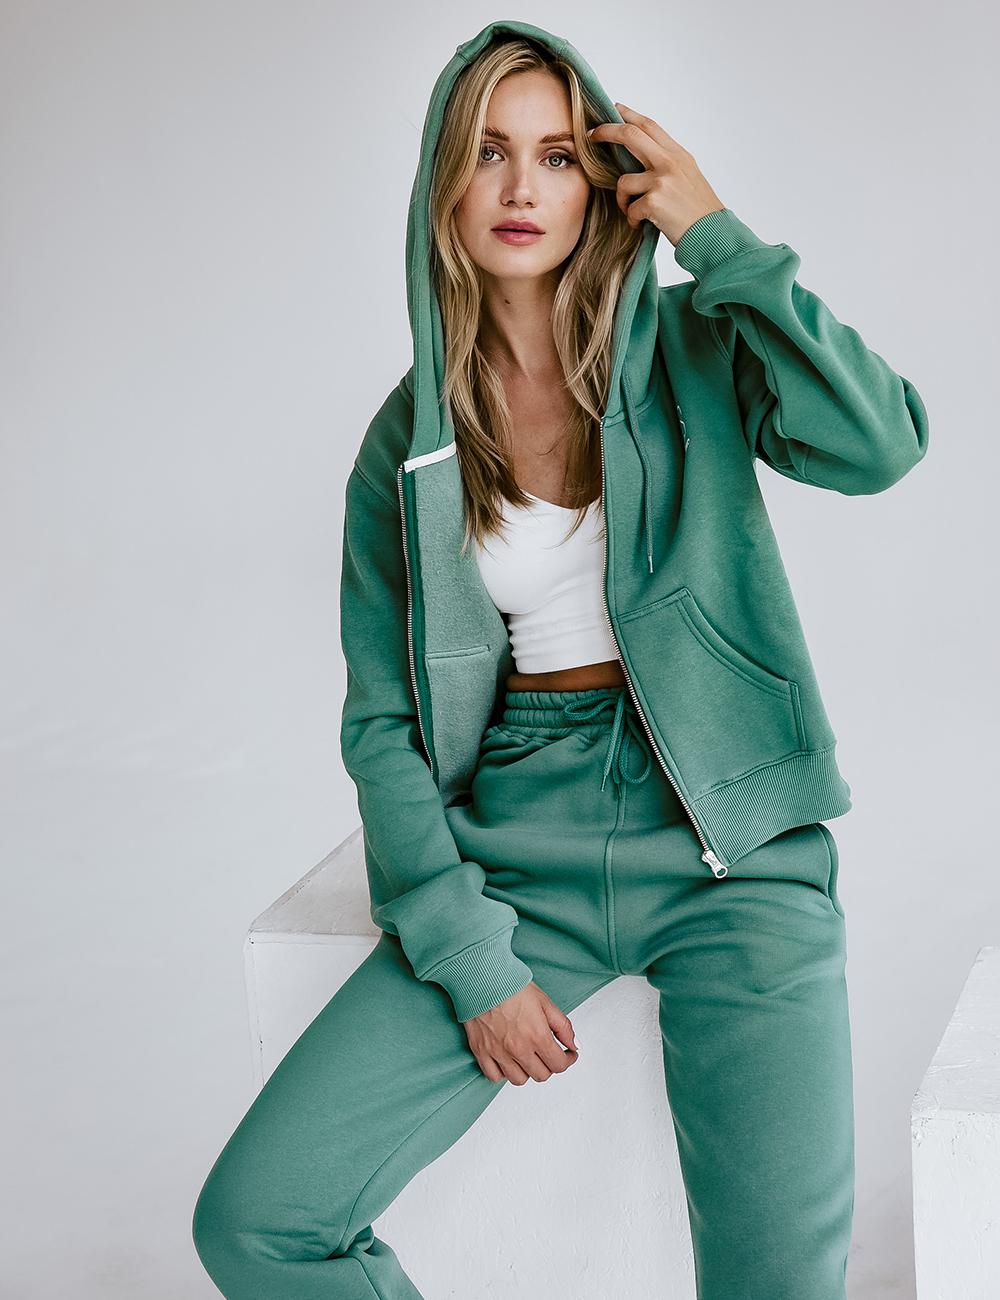 Bluza Crop Zip Zgaszona Mięta - Gymhero